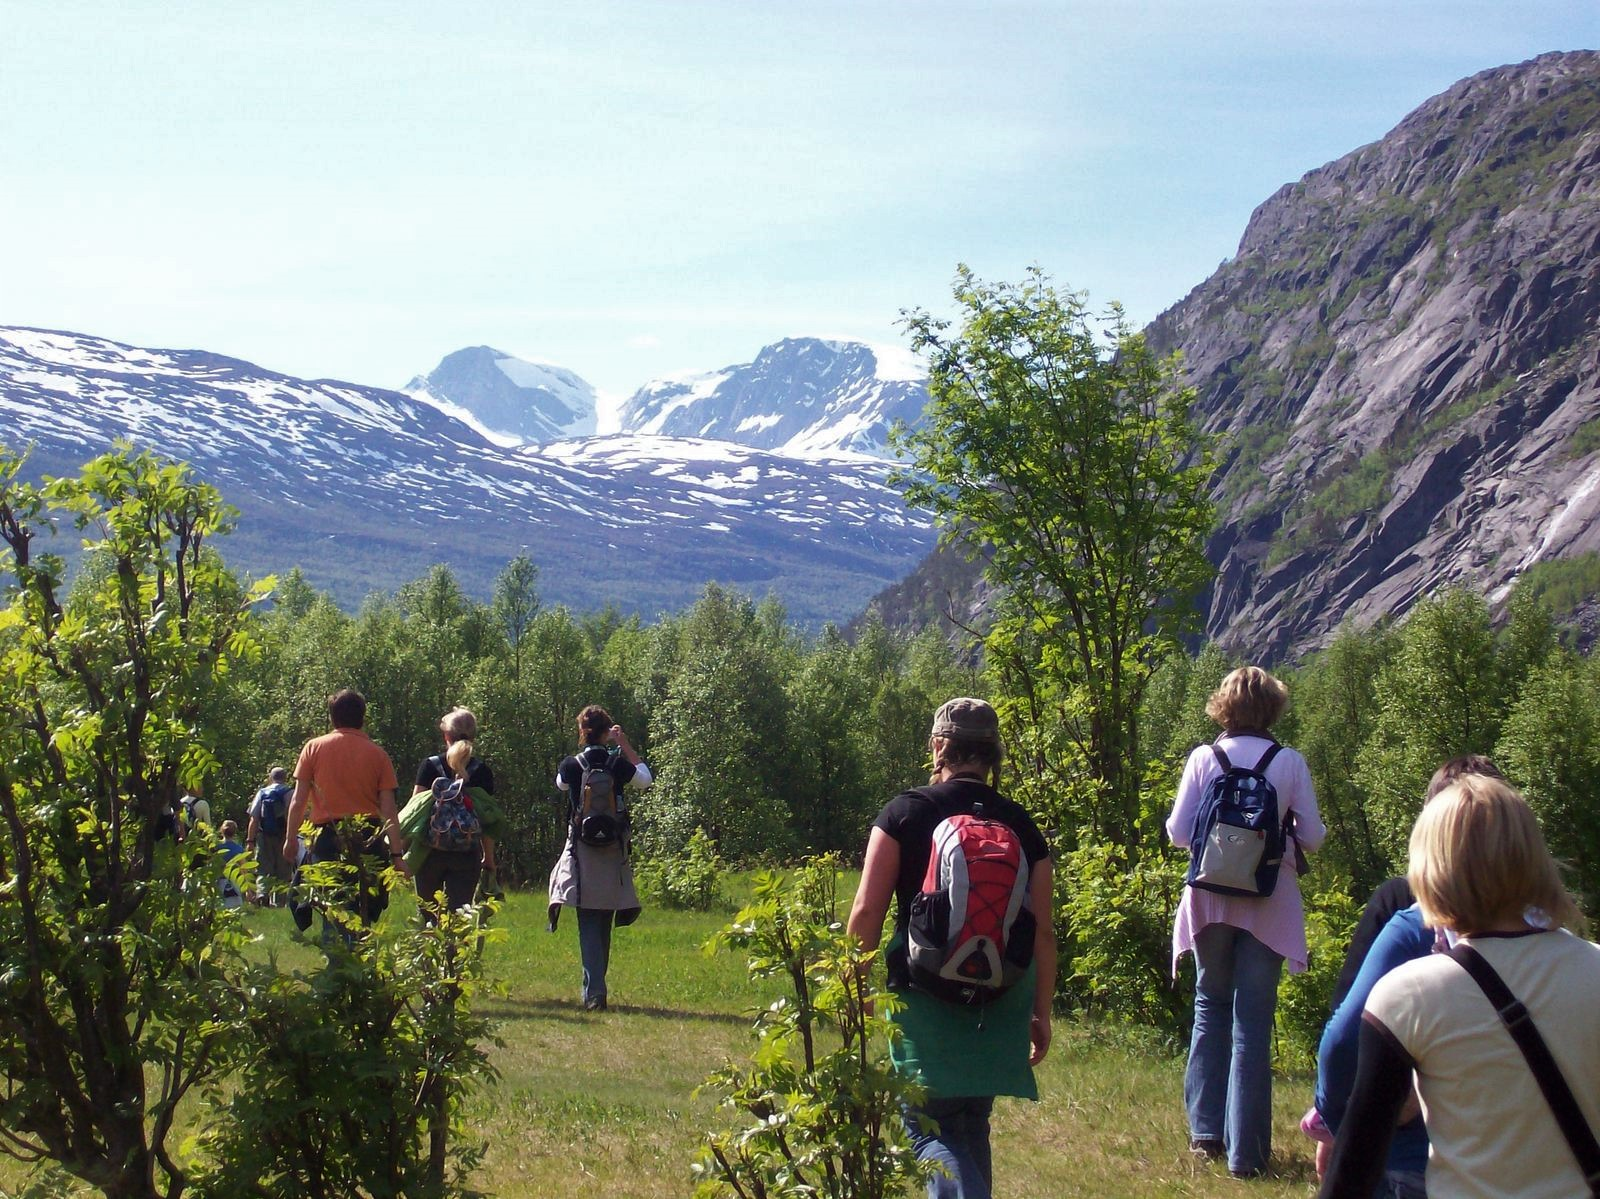 Wanderung zum Rombaksfjord - Norwegen